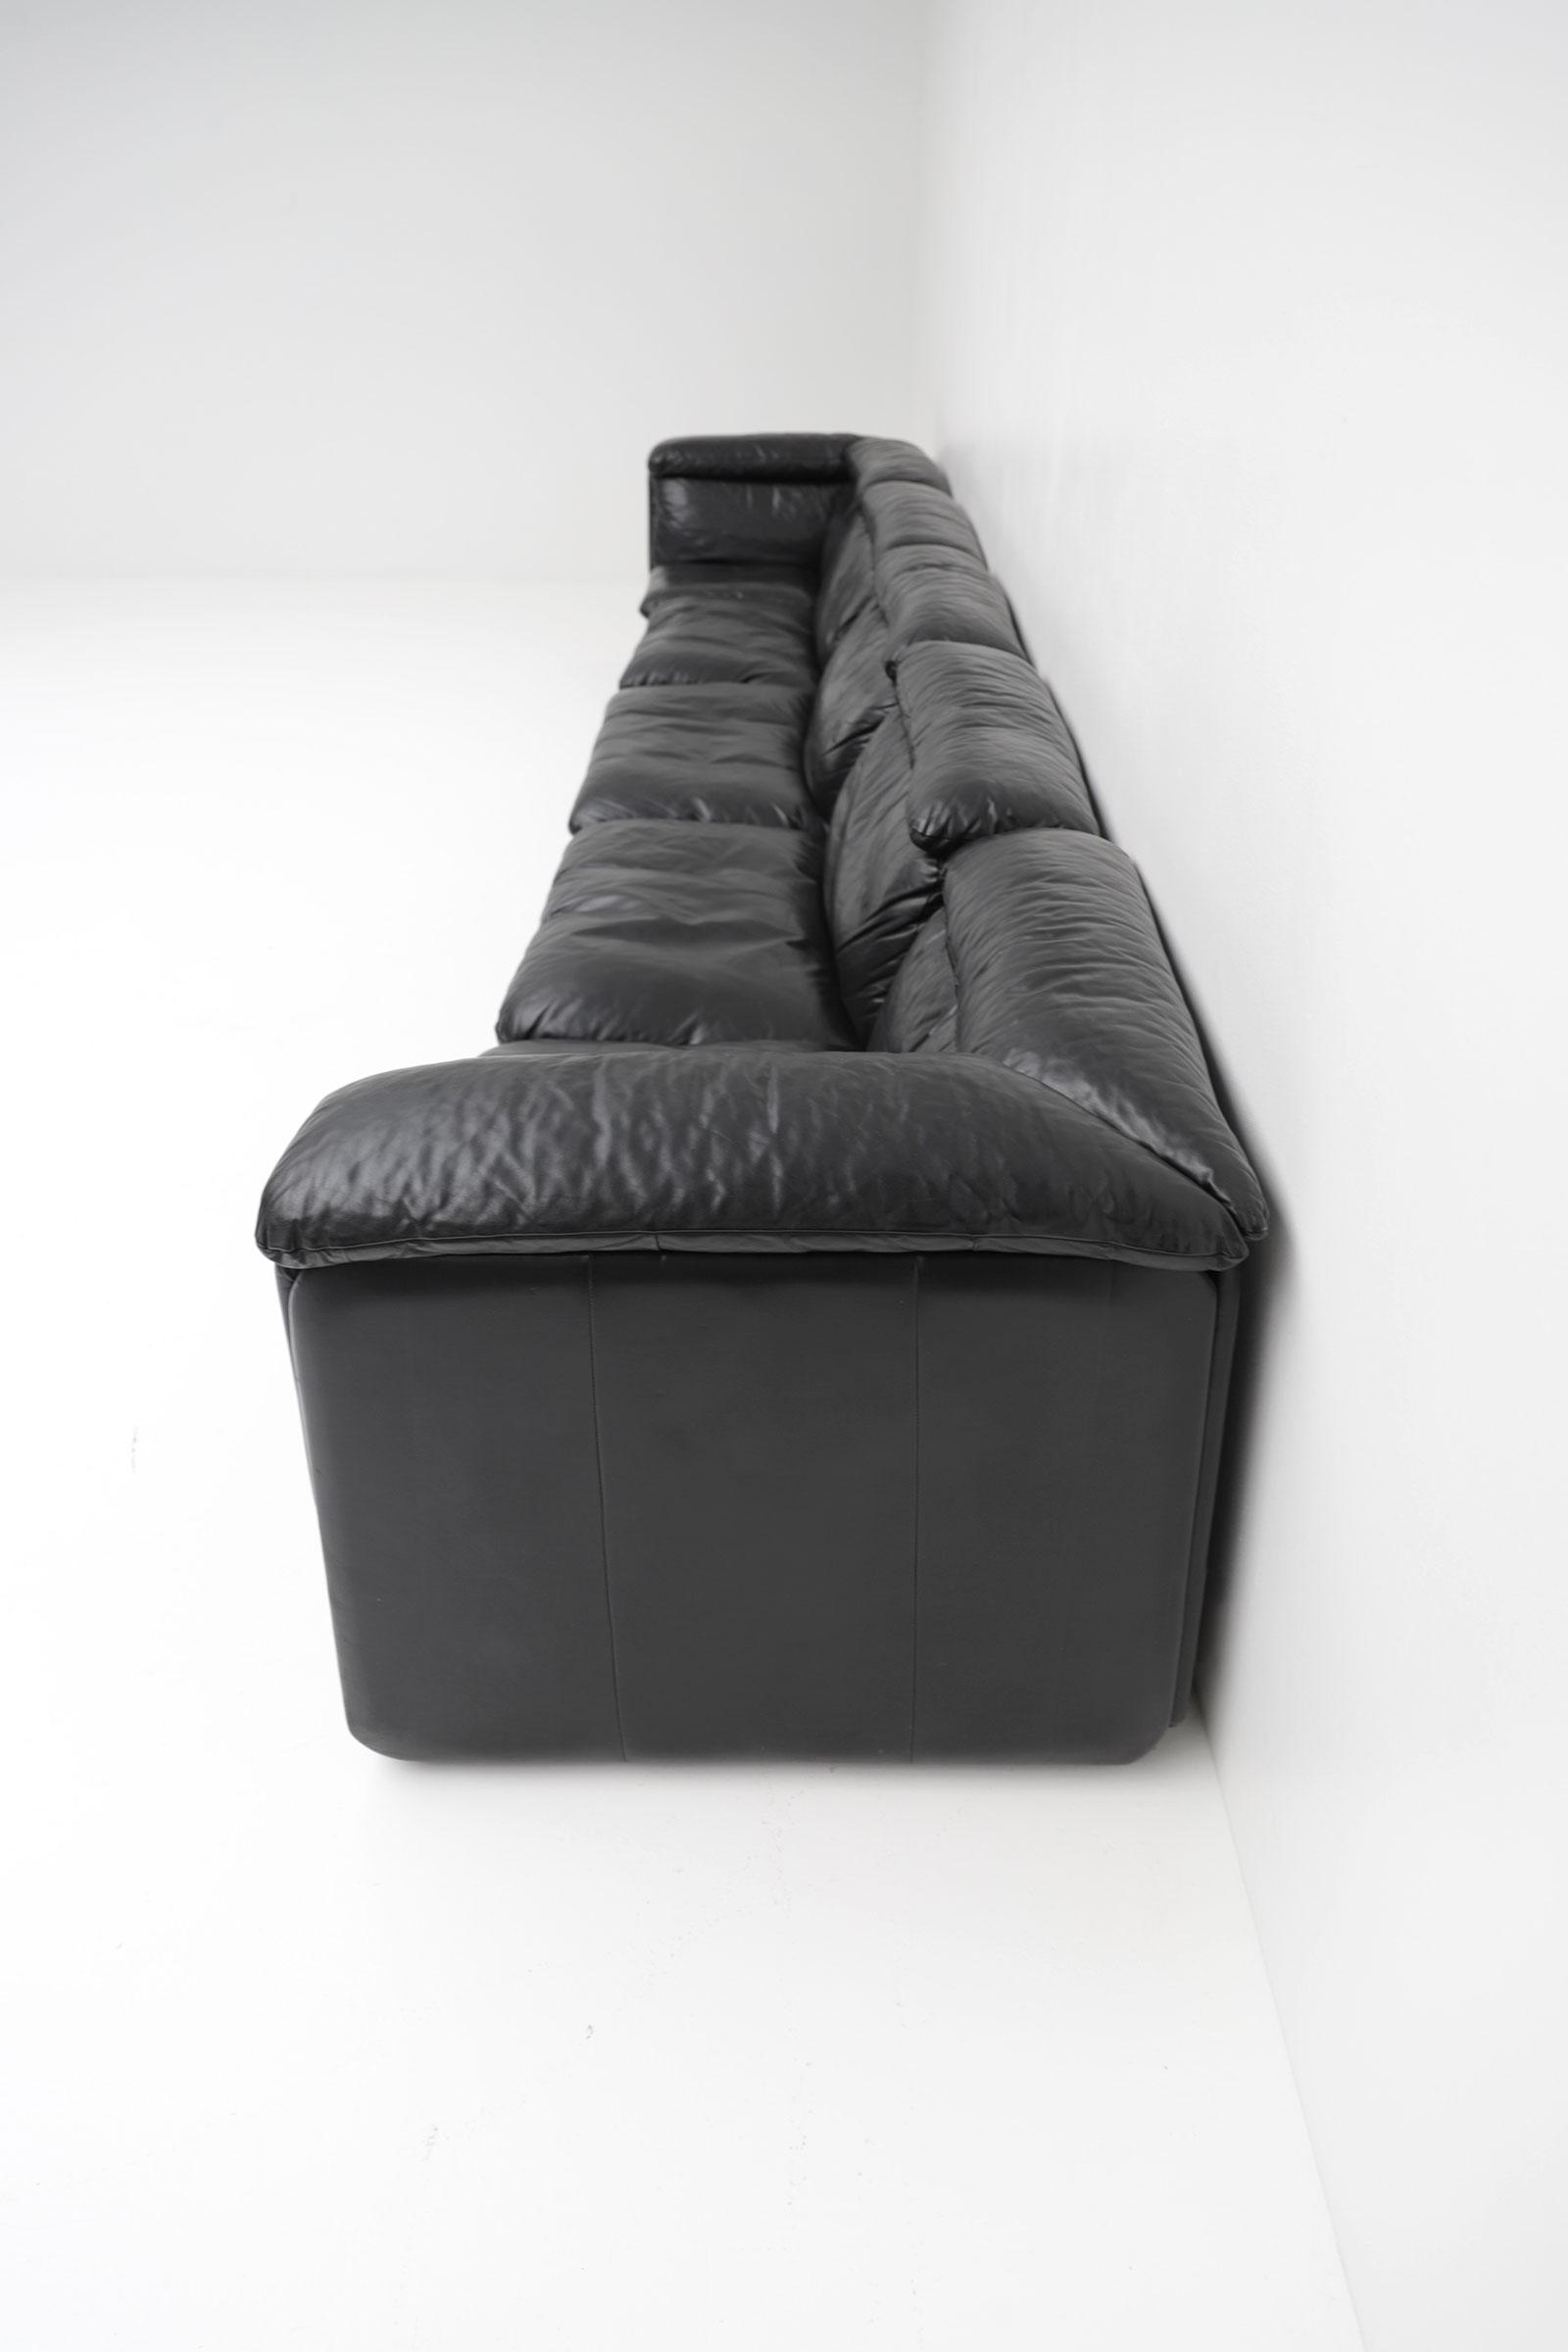 1970s Black Leather Sofa